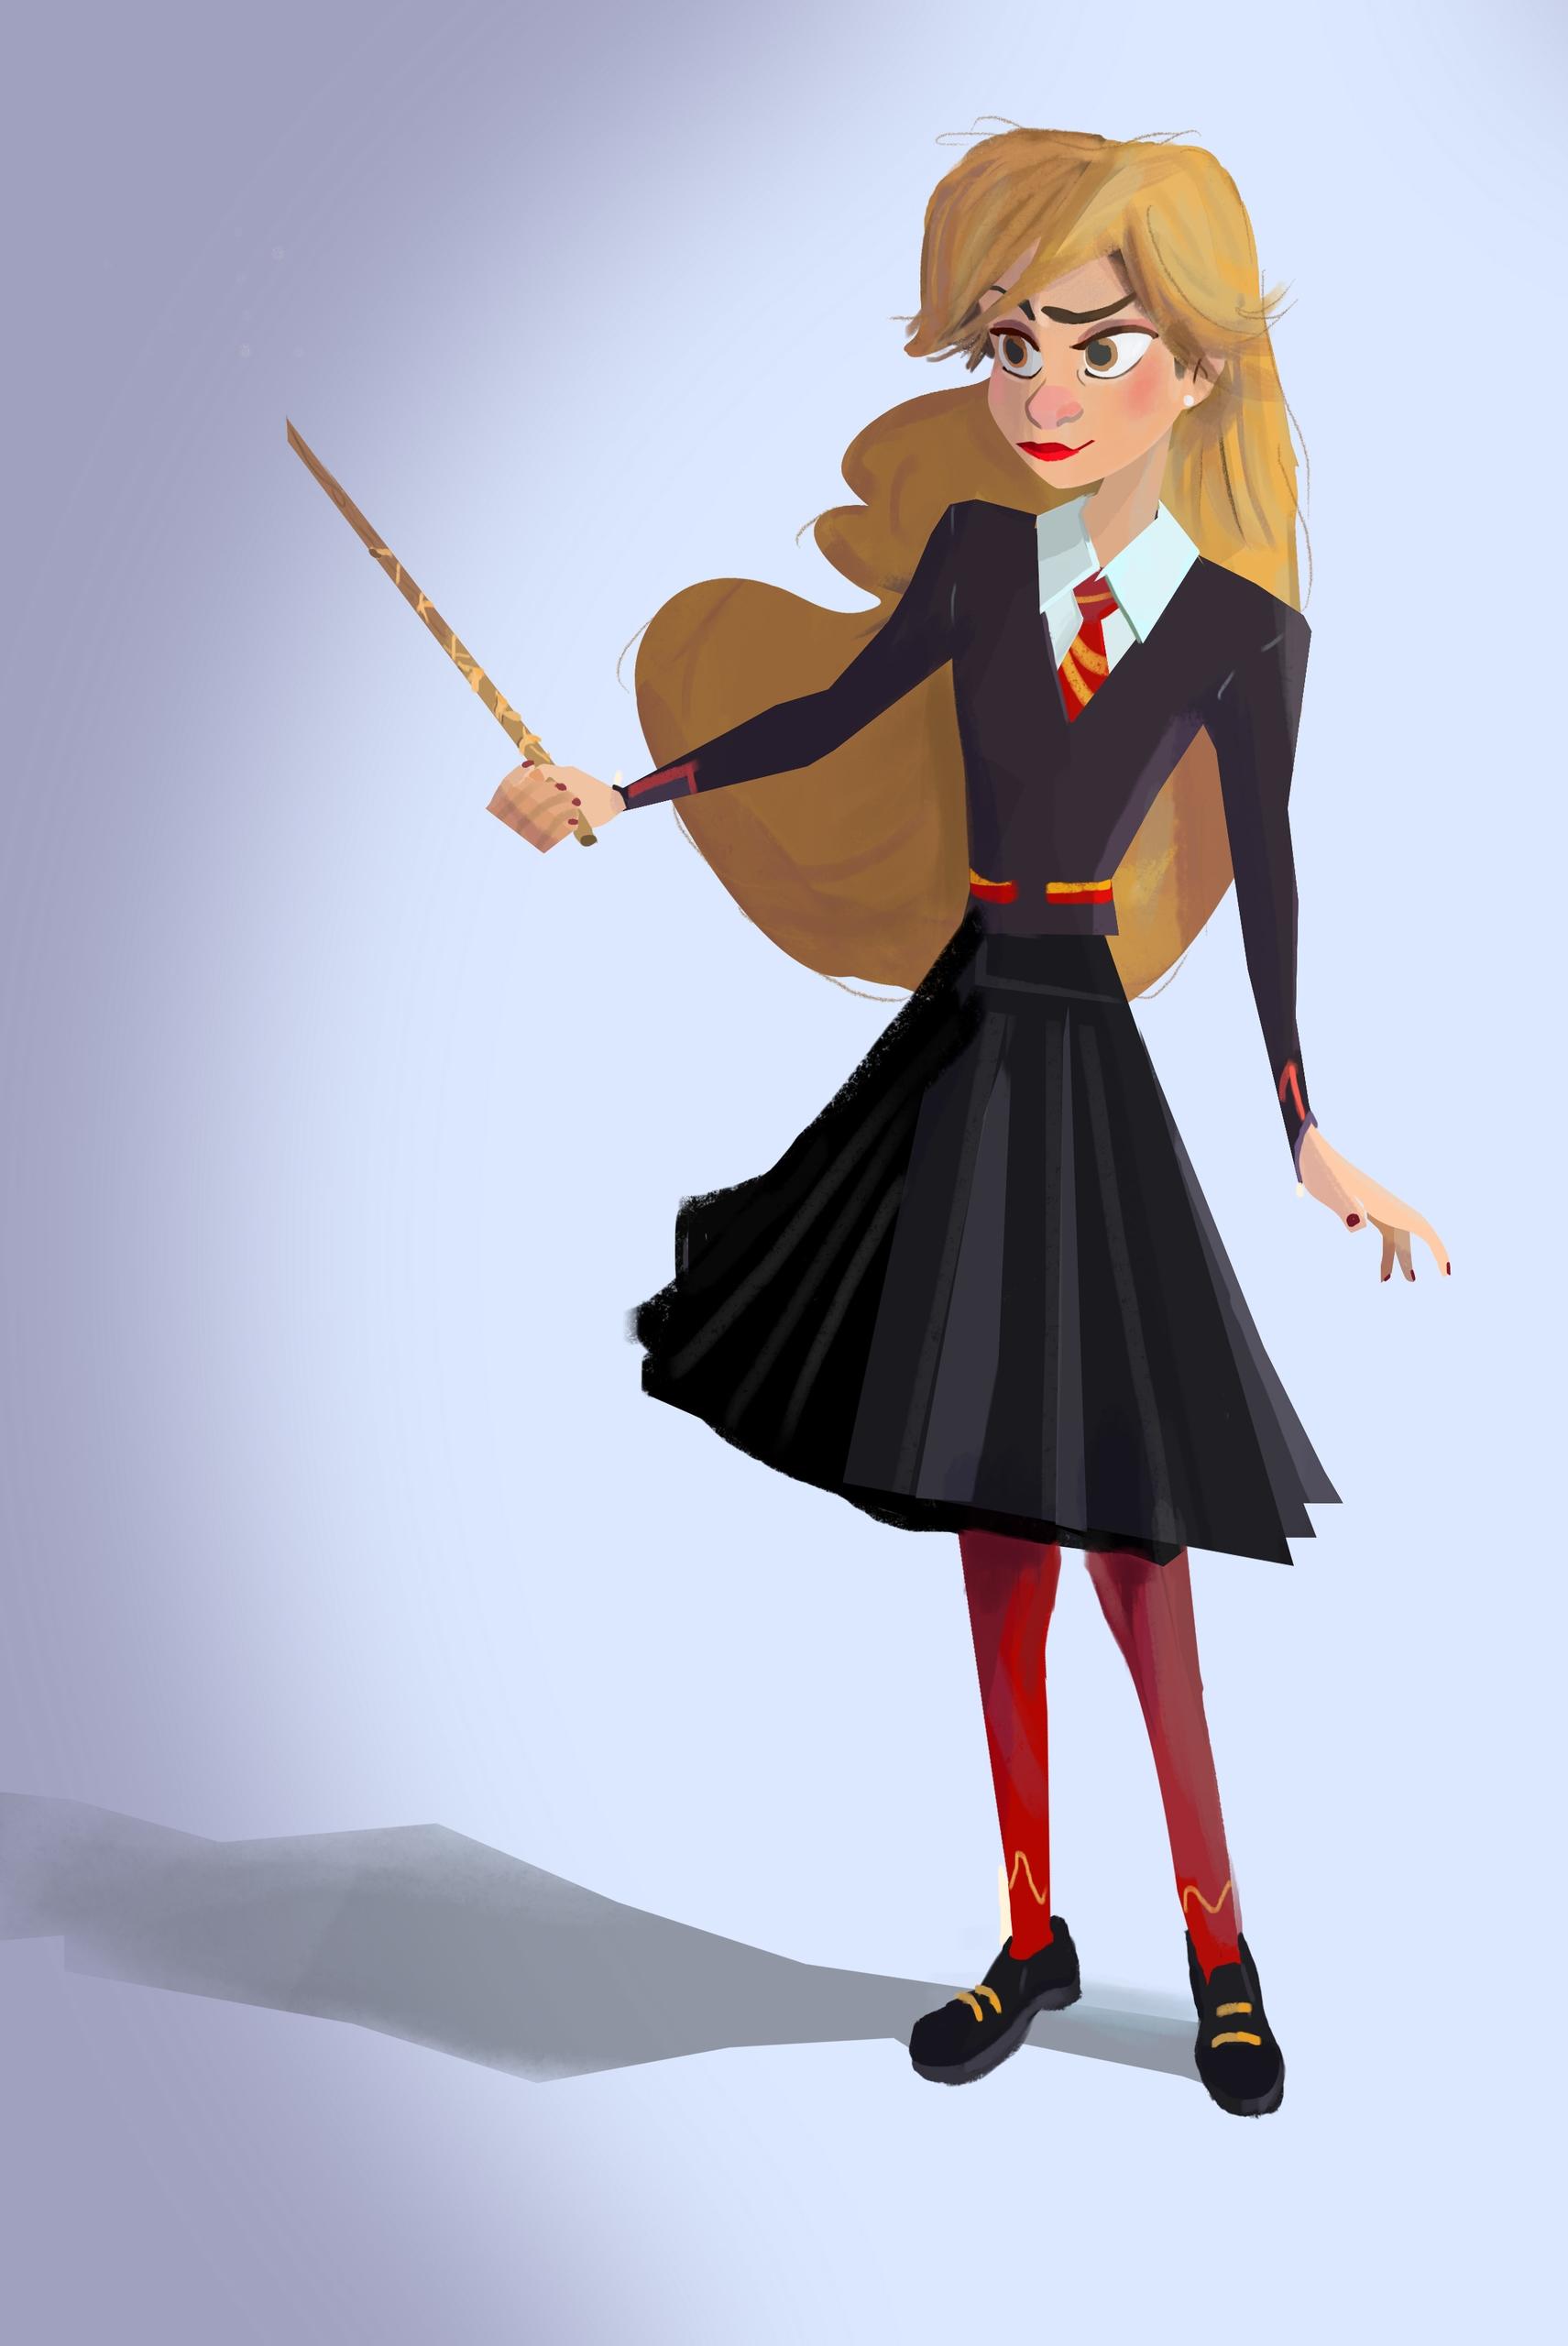 Hermione Granger - hermionegranger - cleleroy | ello